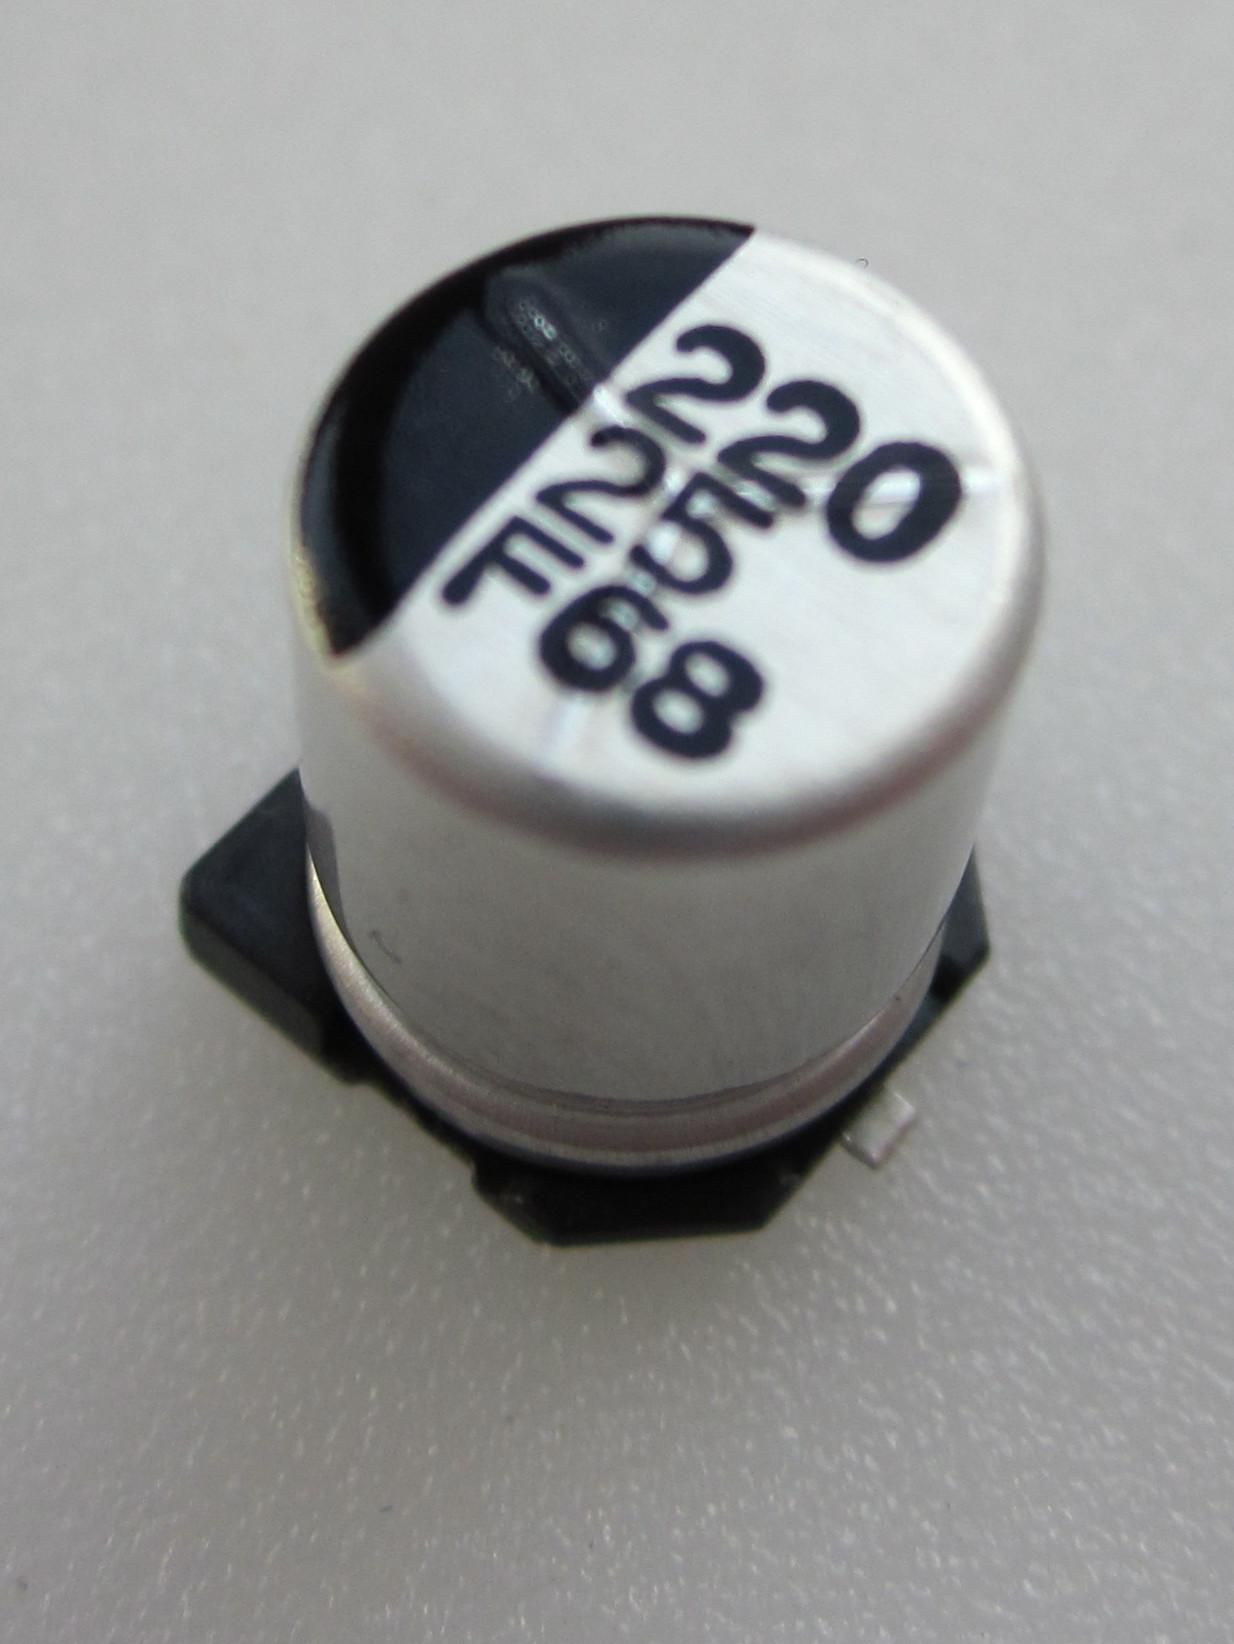 220,0x25V smd